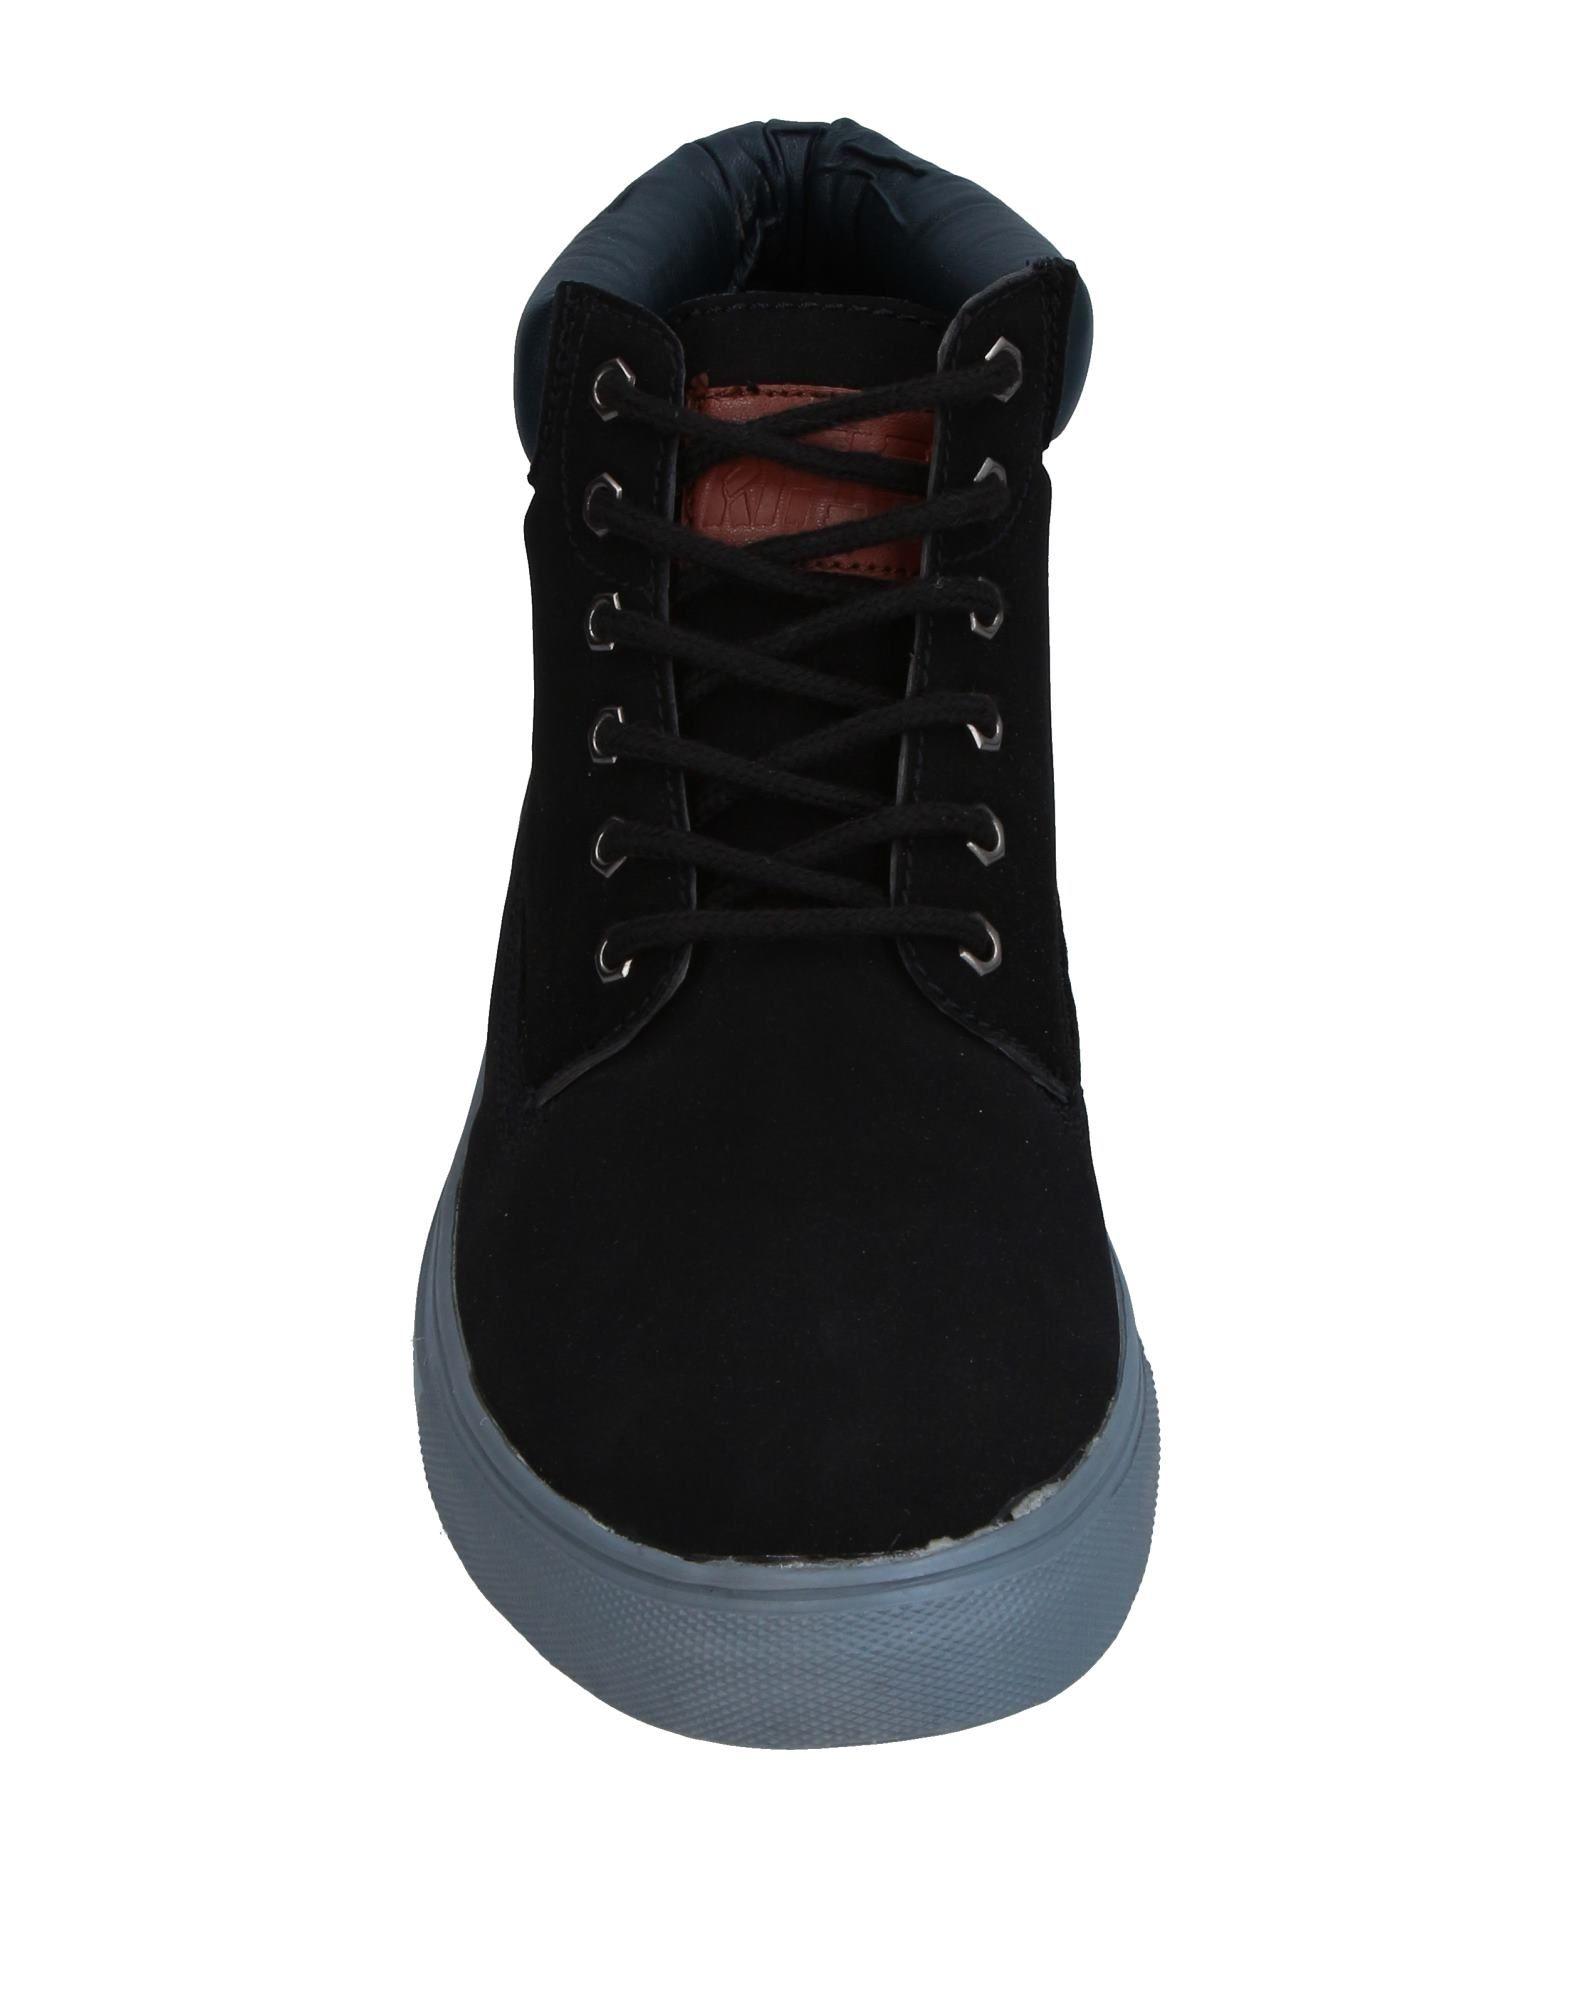 11275945FV Rifle Sneakers Herren  11275945FV  ba5cfb